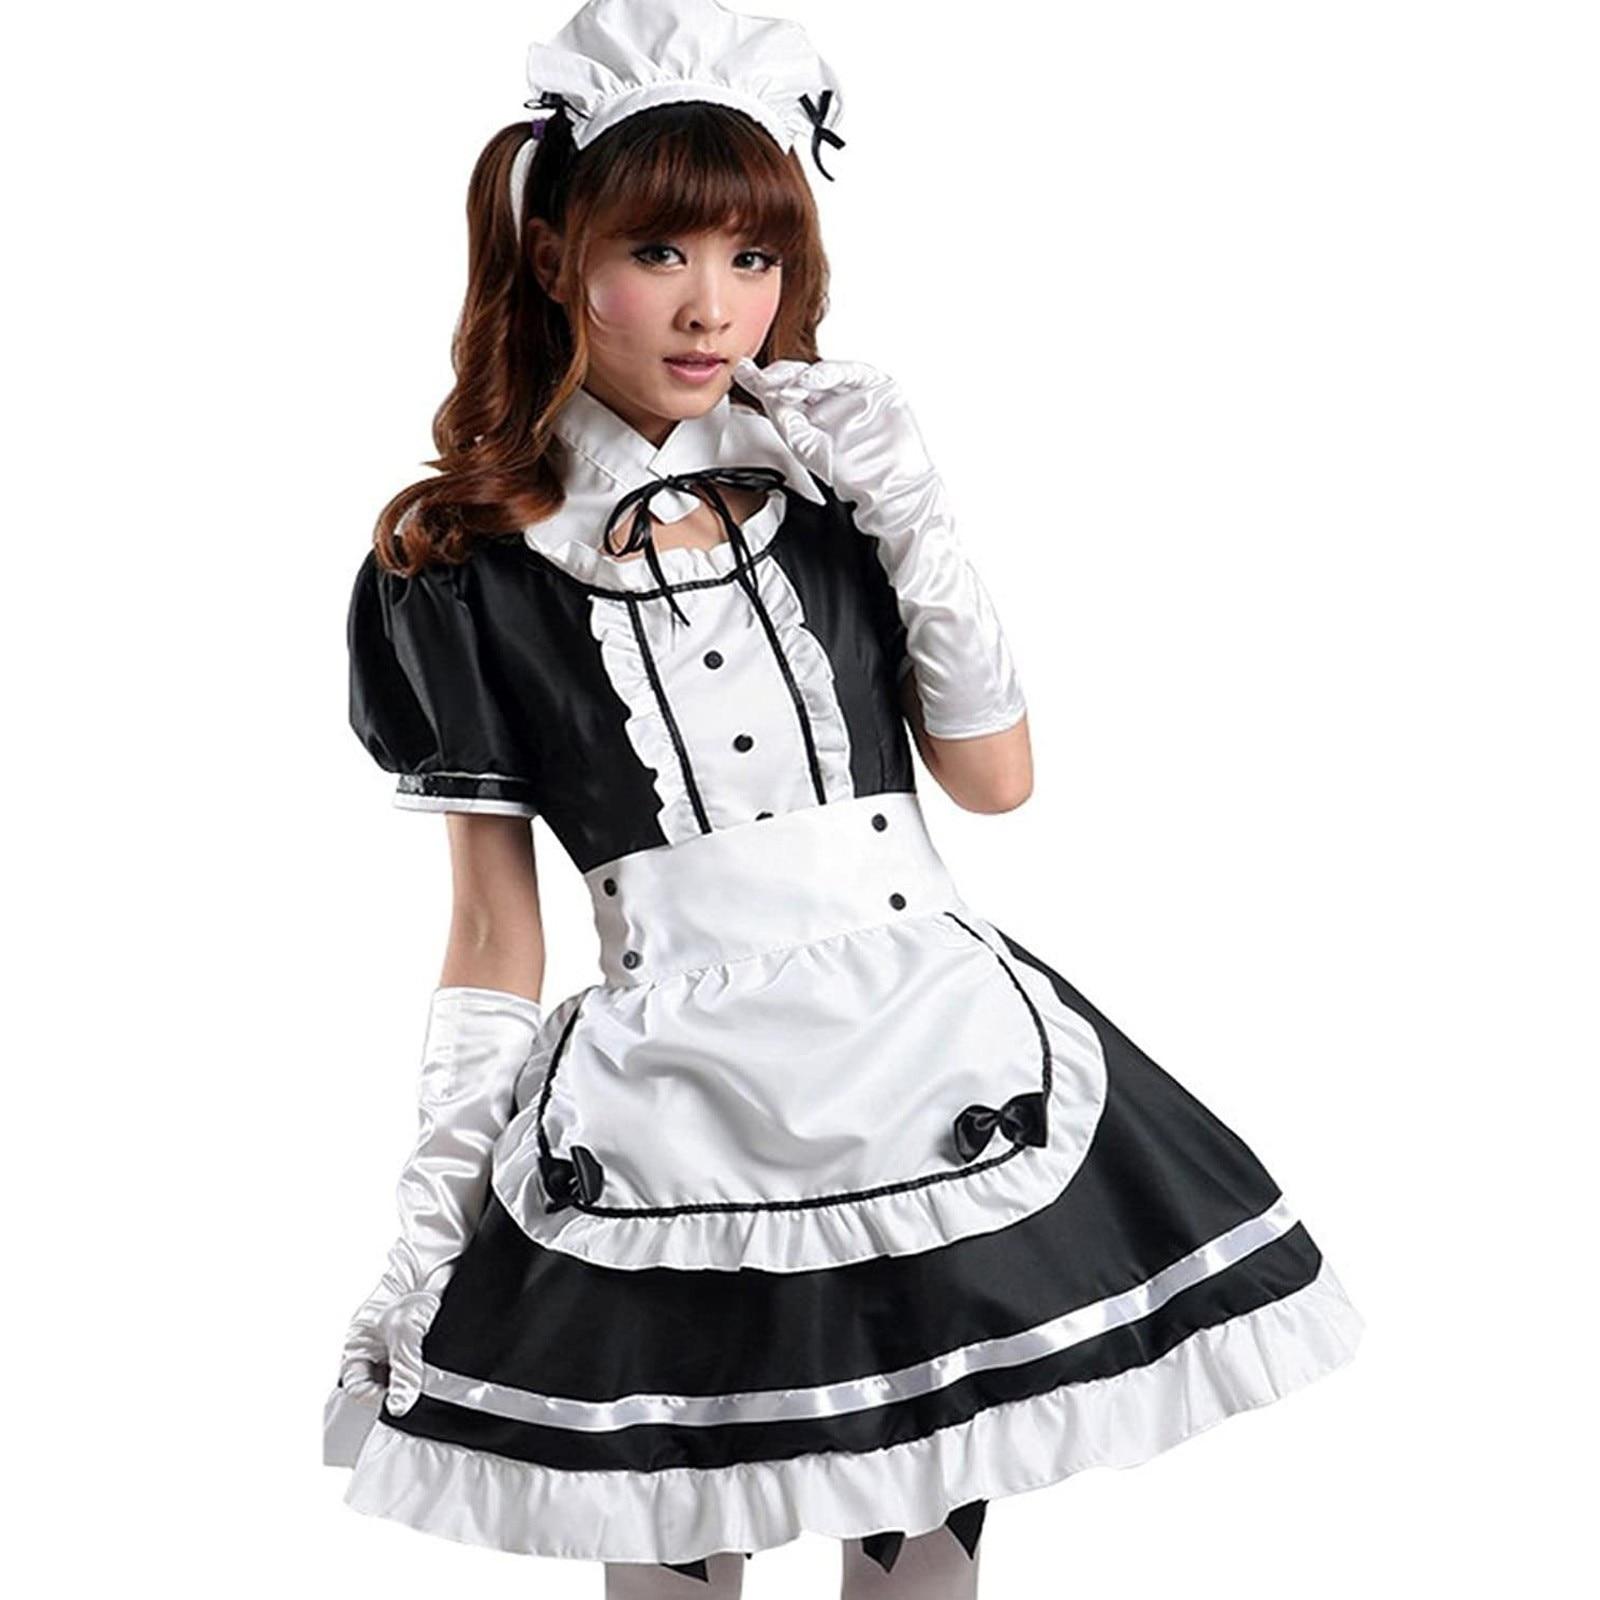 4# Maid Cosplay Costume Dresses Women Headwear Apron Fake Collar Bowknot Dress Sweet Kawaii Short Sleeve Dresses Kleider Damen 7